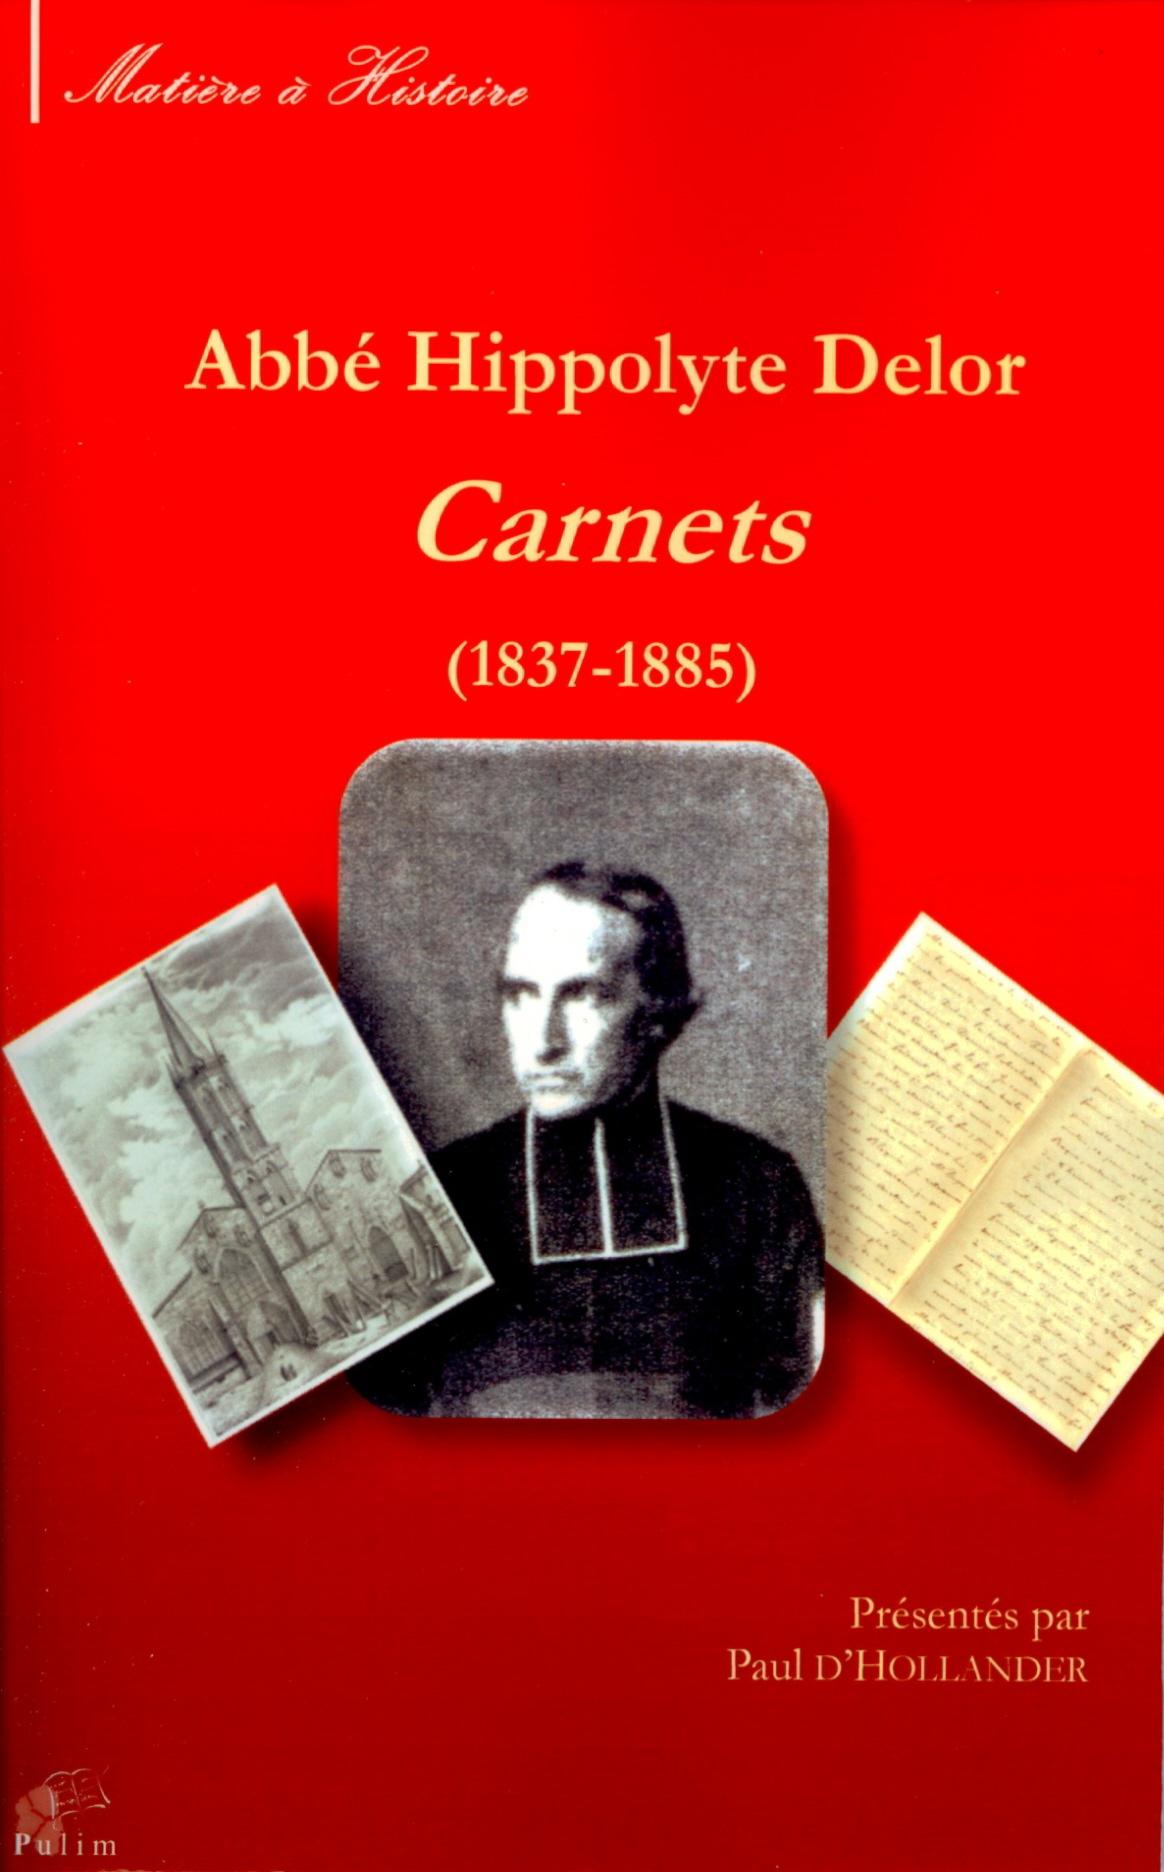 Abbé Hippolyte Delor